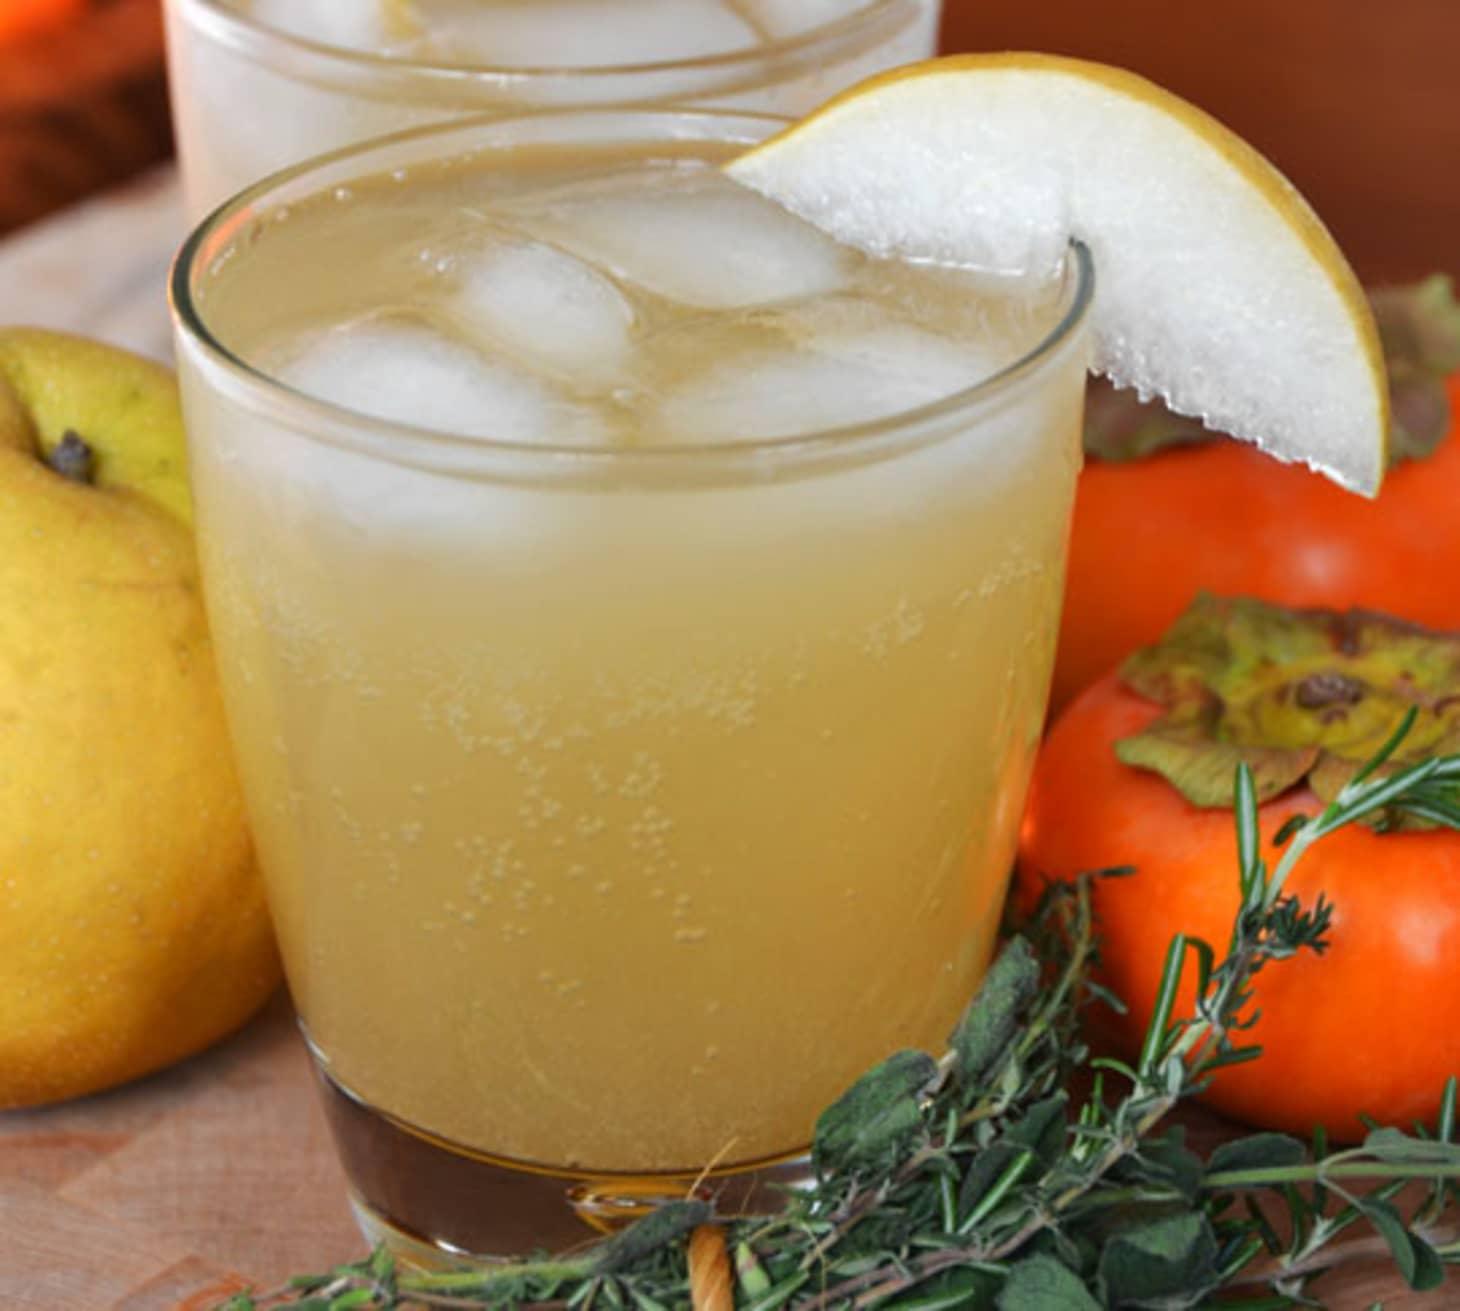 Non Alcoholic Drinks: 12 Non-Alcoholic Drinks To Sip All Fall